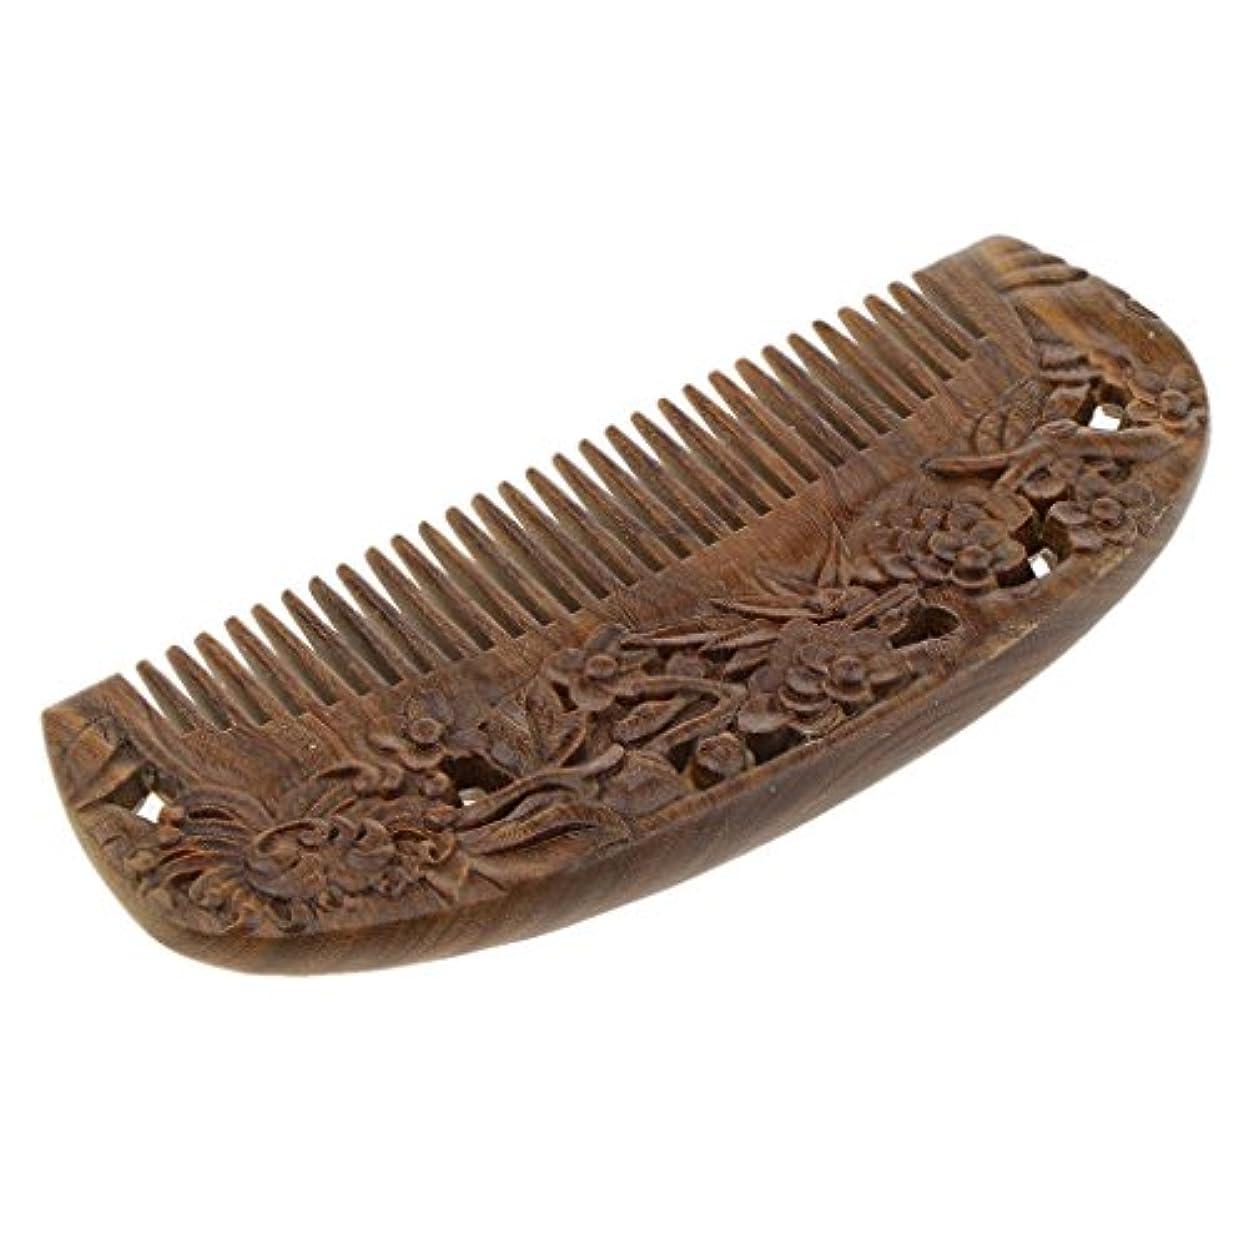 Baosity ヘアコーム 木製櫛 頭皮マッサージ 櫛 ヘアケア 静電気防止  イプ選べる - #2